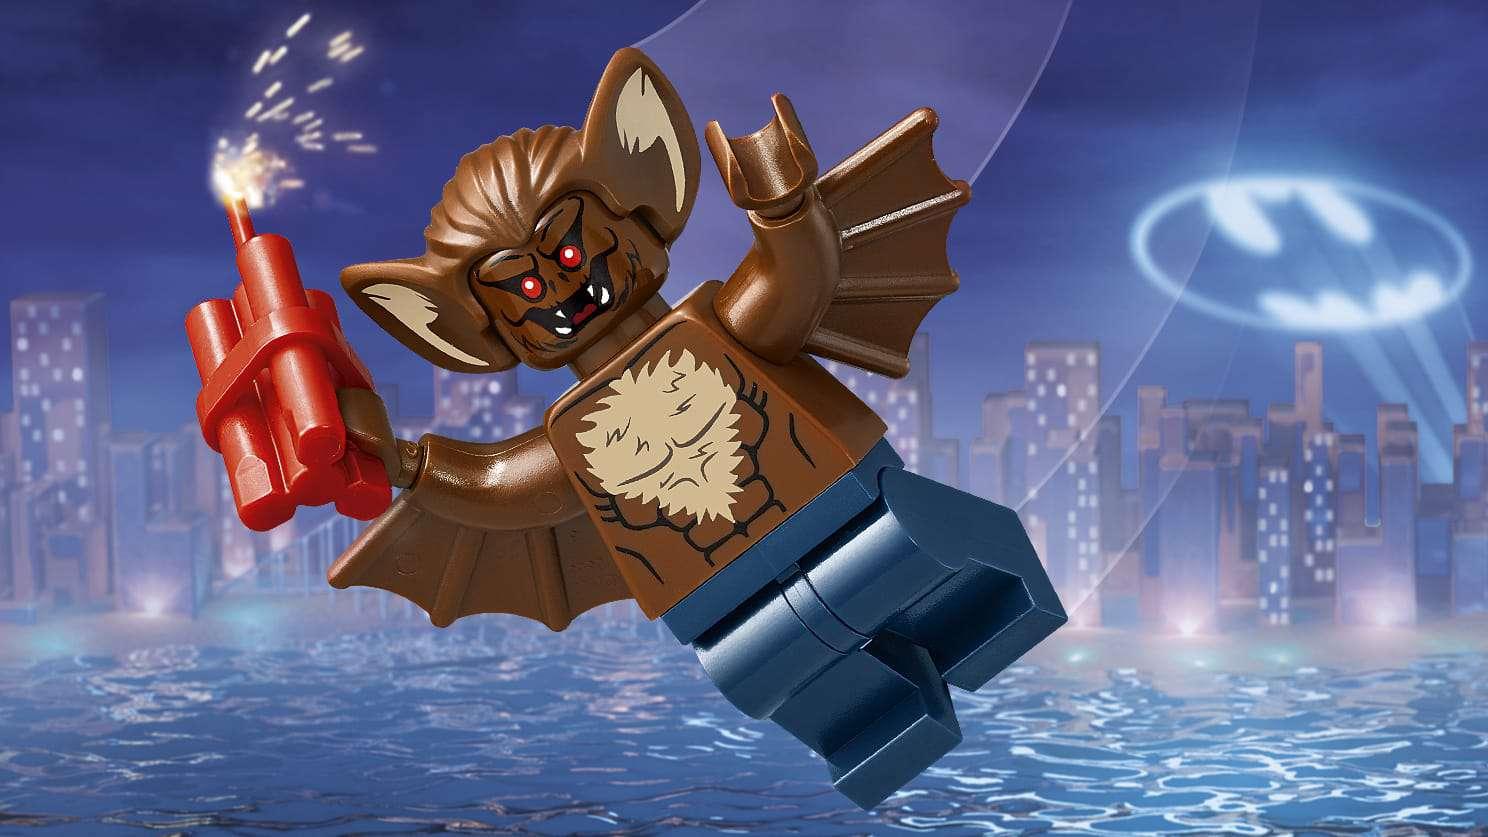 The LEGO Batman Movie Villains -  Man Bat